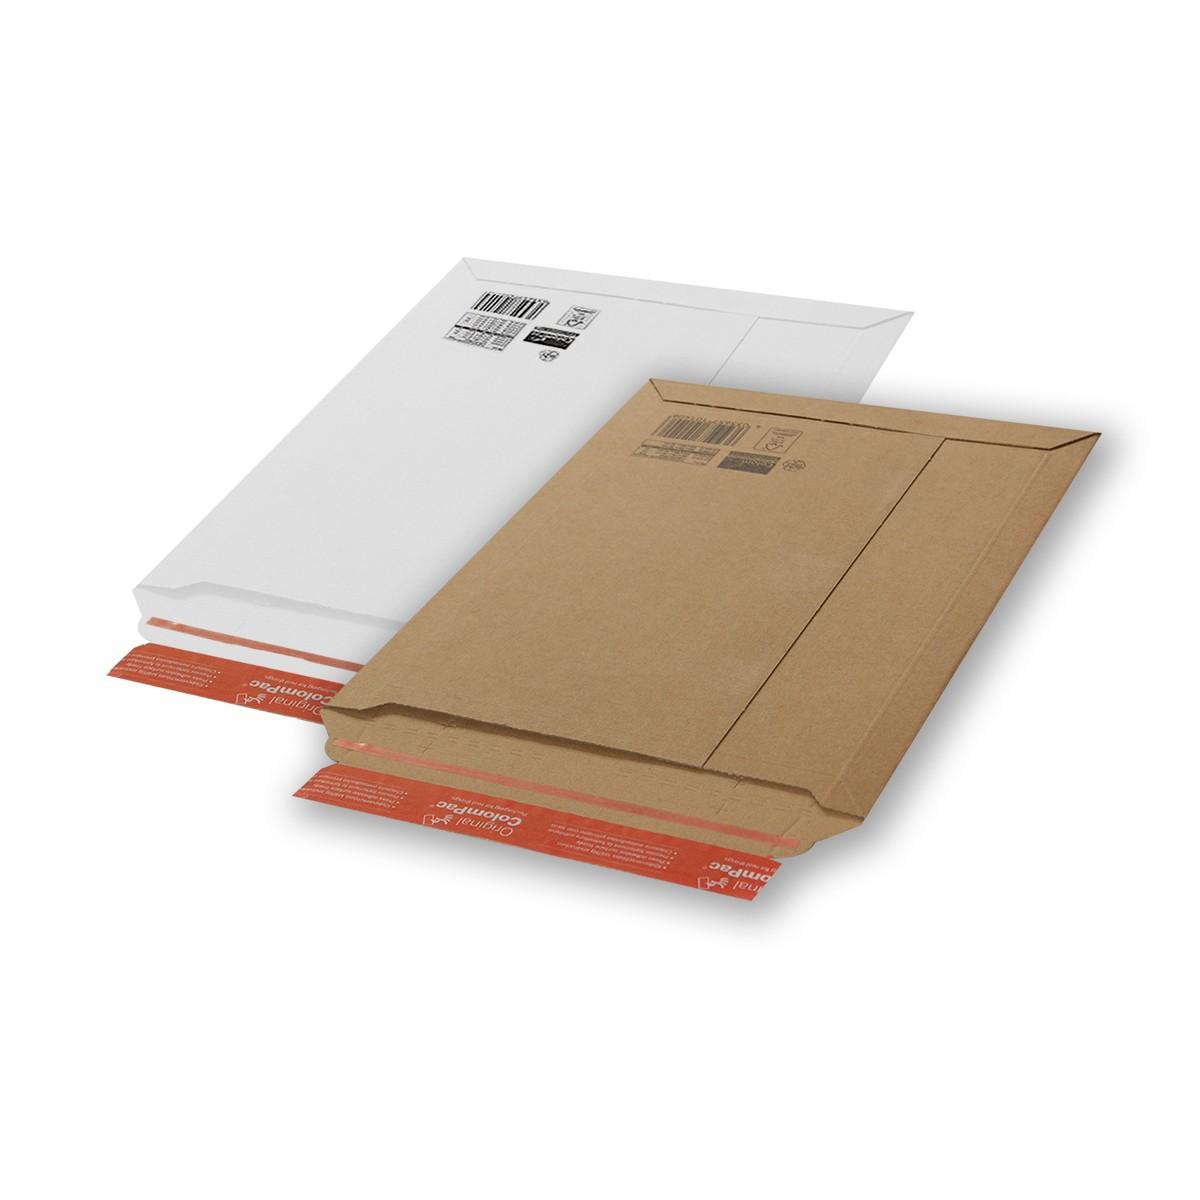 Einzelverpackung Wellpapp-Versandtasche 285 x 200 mm